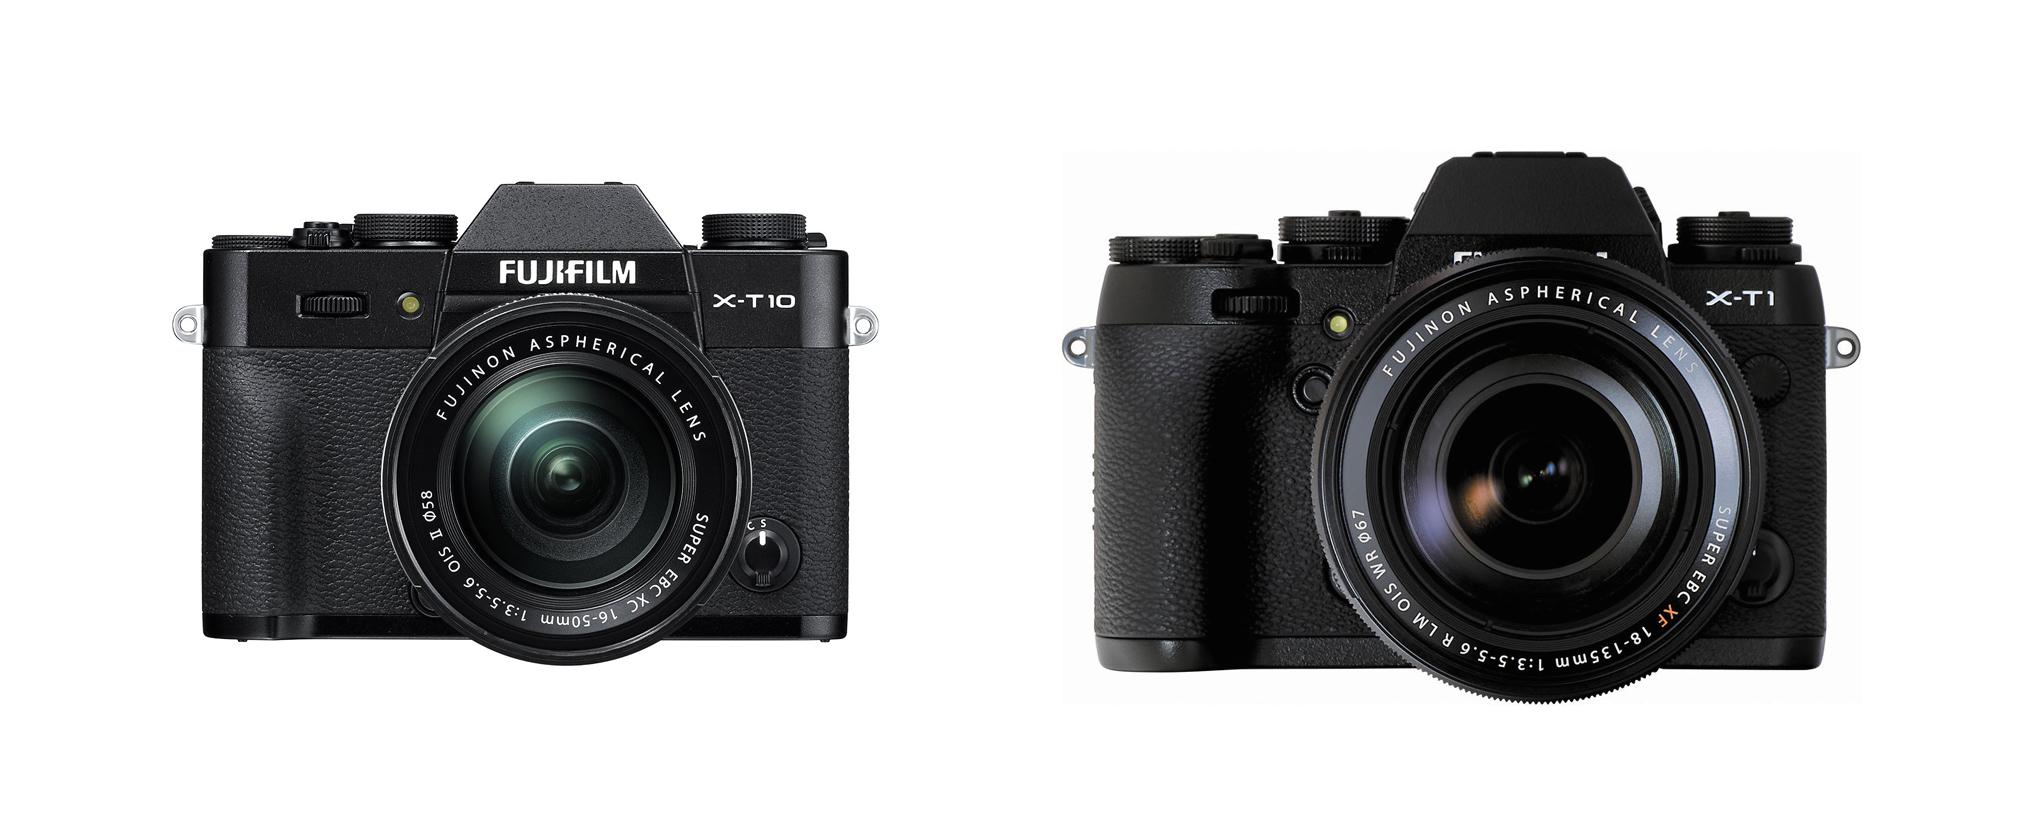 fujifilm-x-t10-vs-x-t1